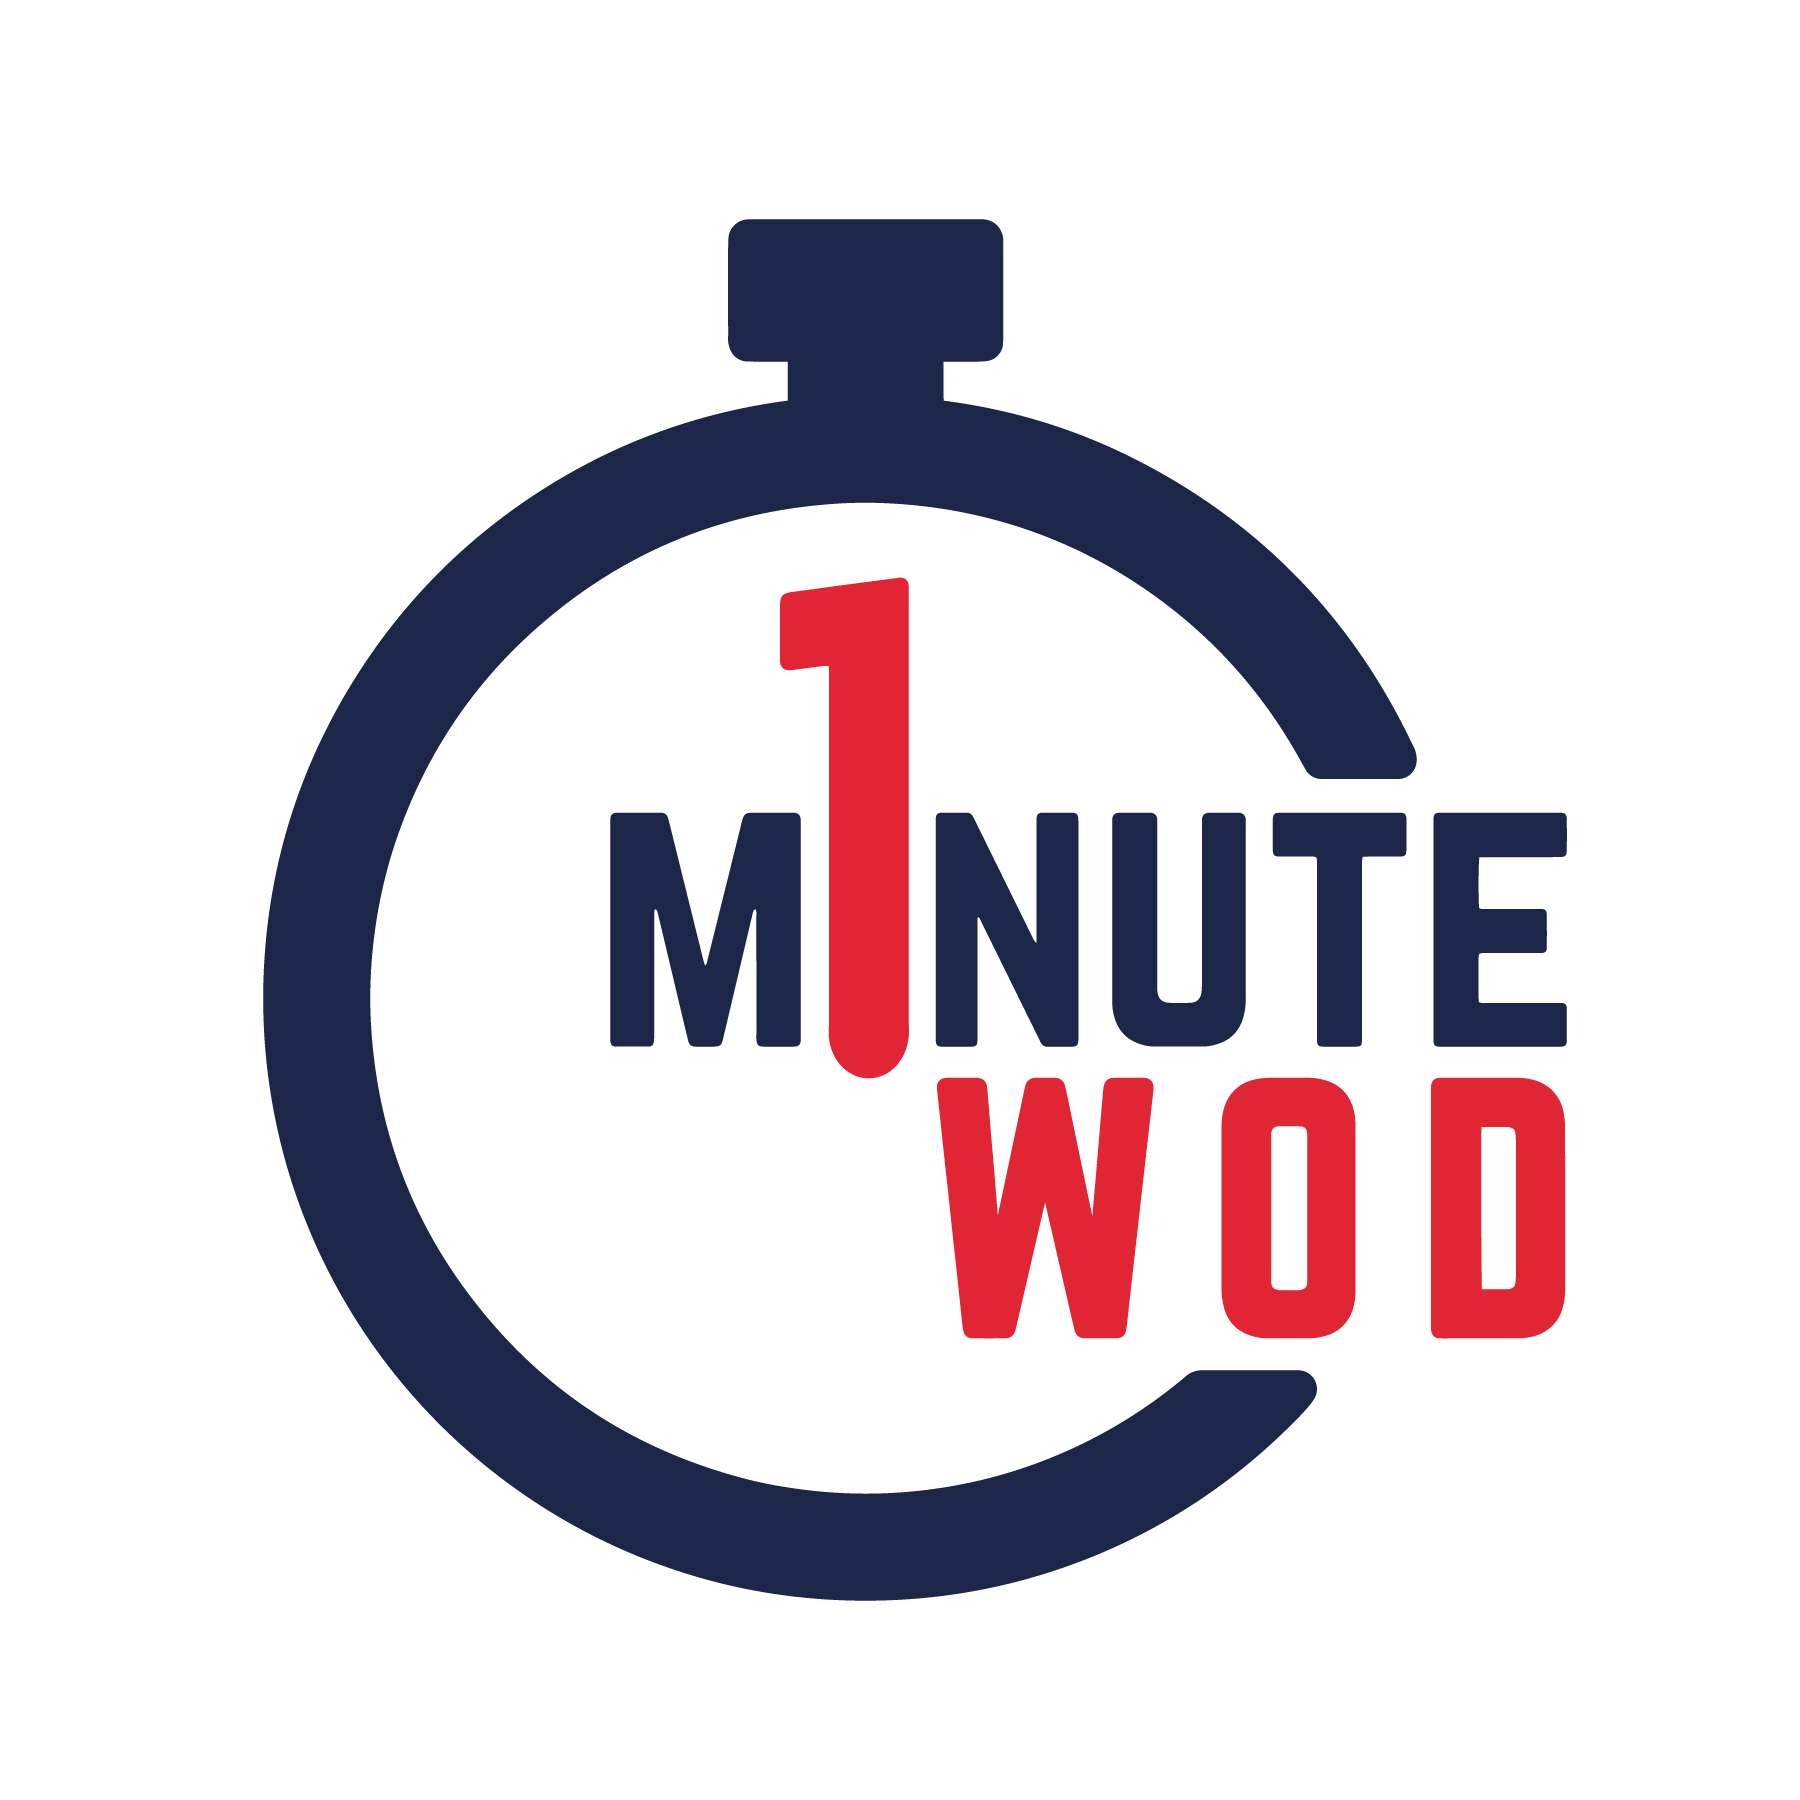 1 Minute WOD Logo